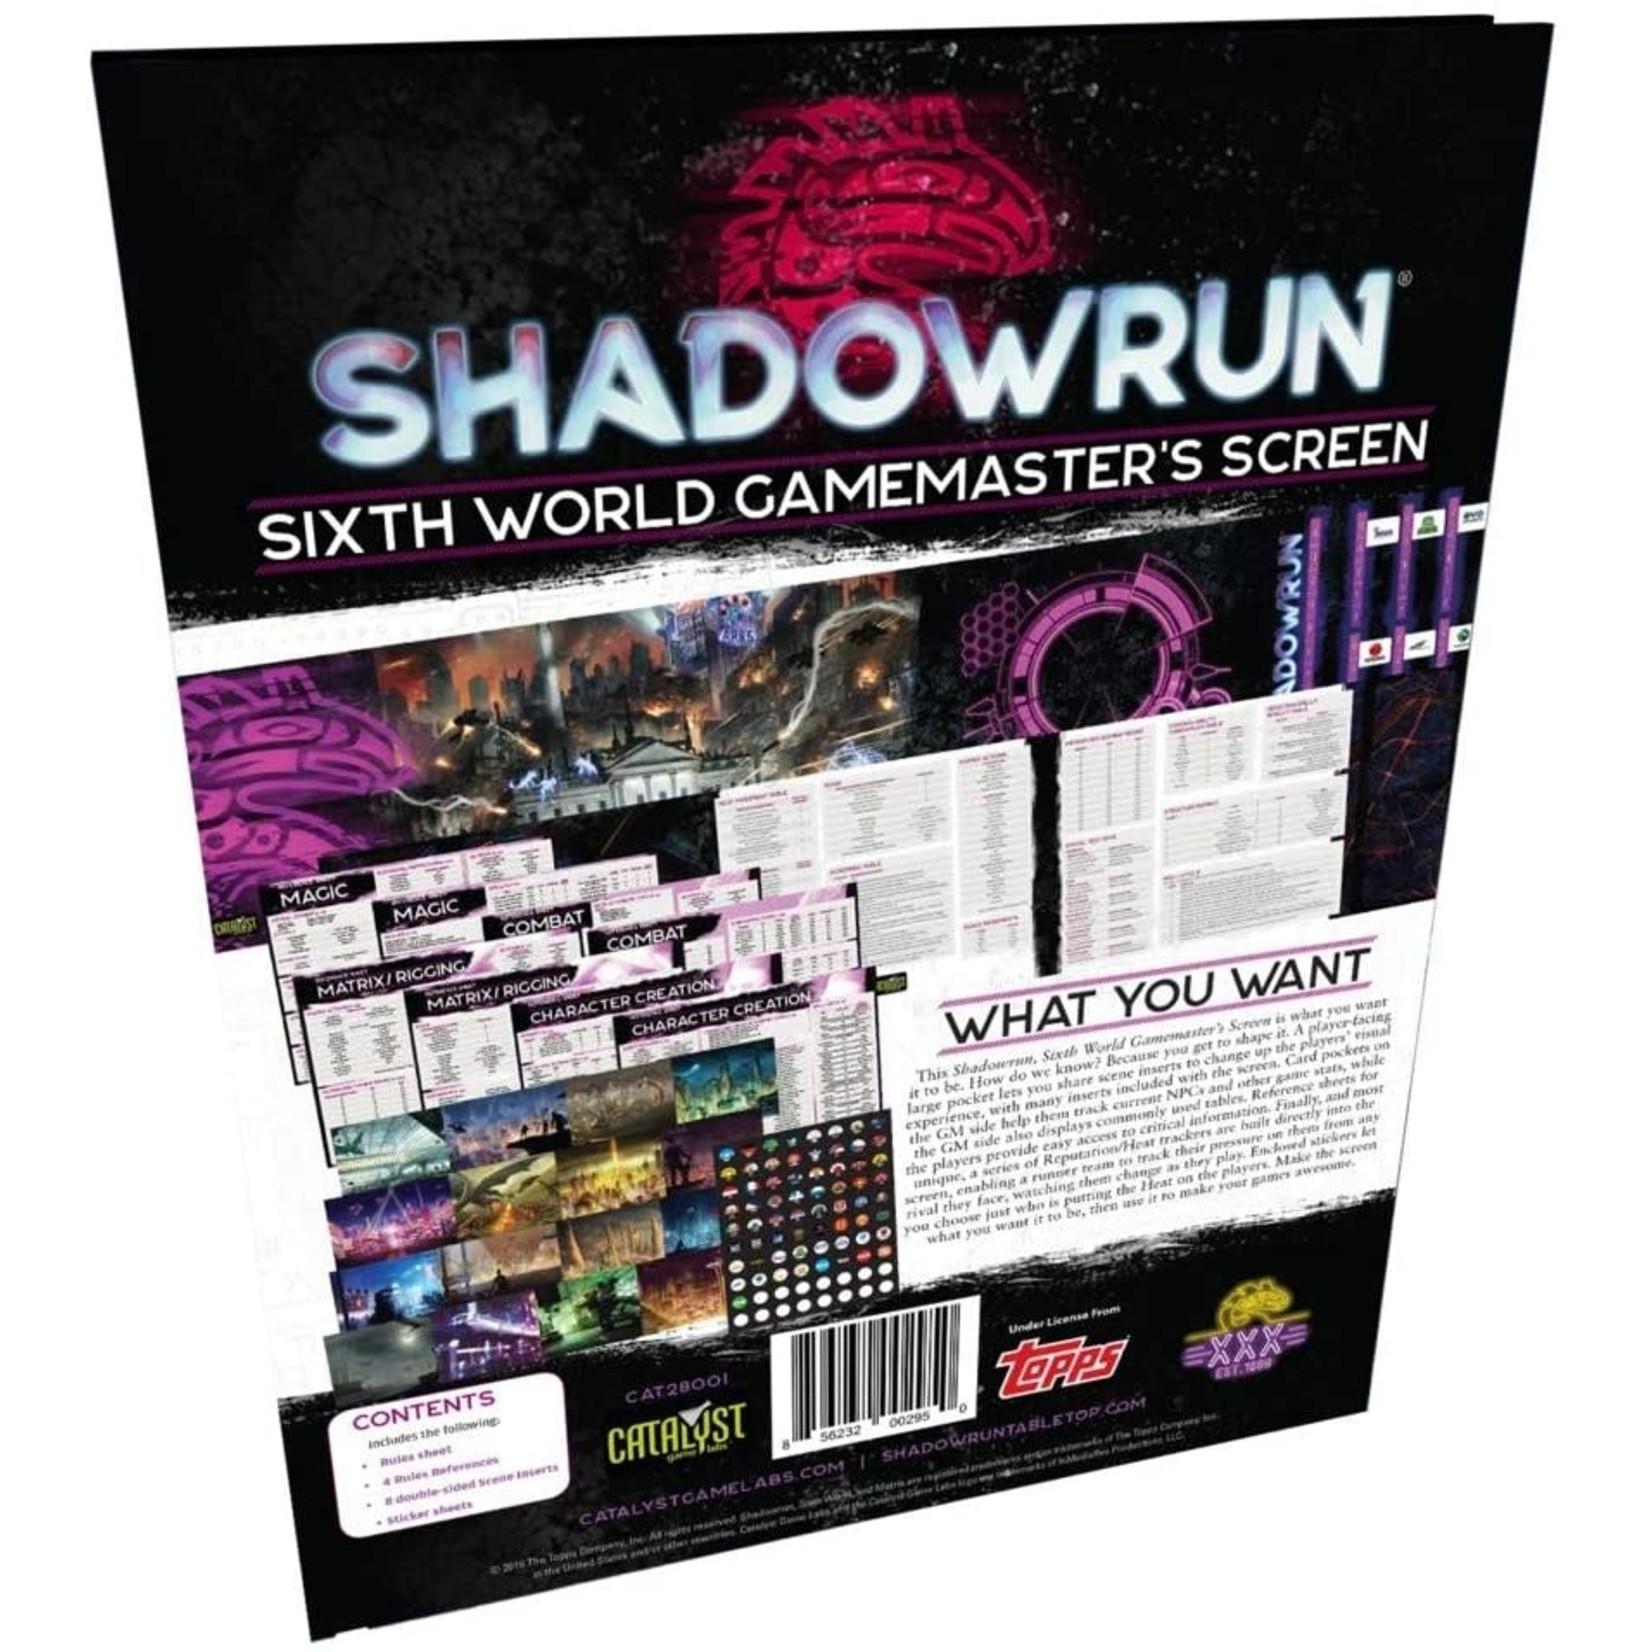 Shadowrun RPG 6th Edition Gamemasters Screen